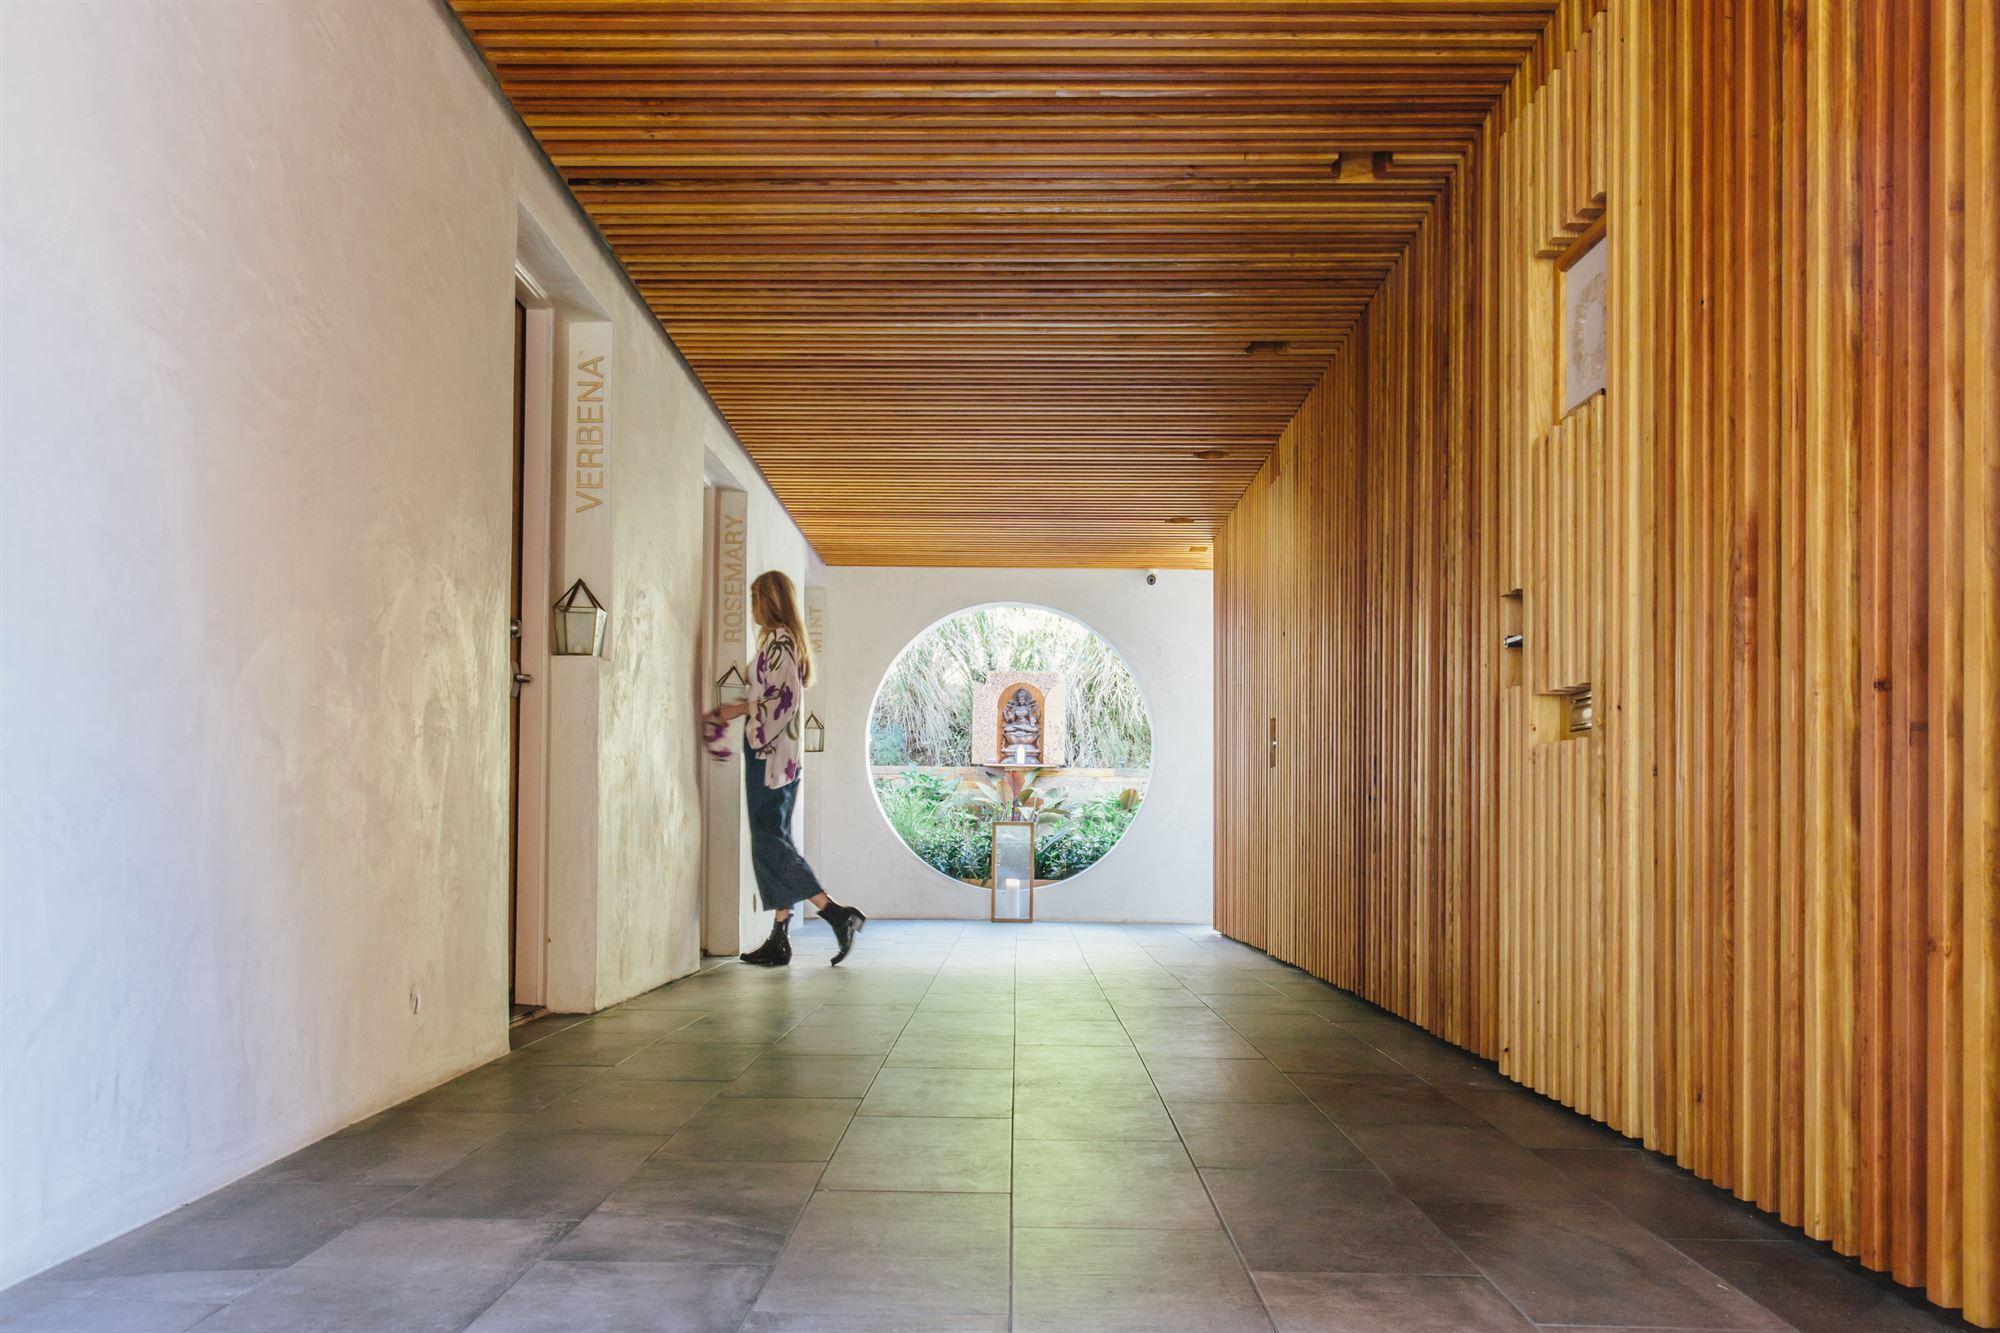 Look down wellness hallway